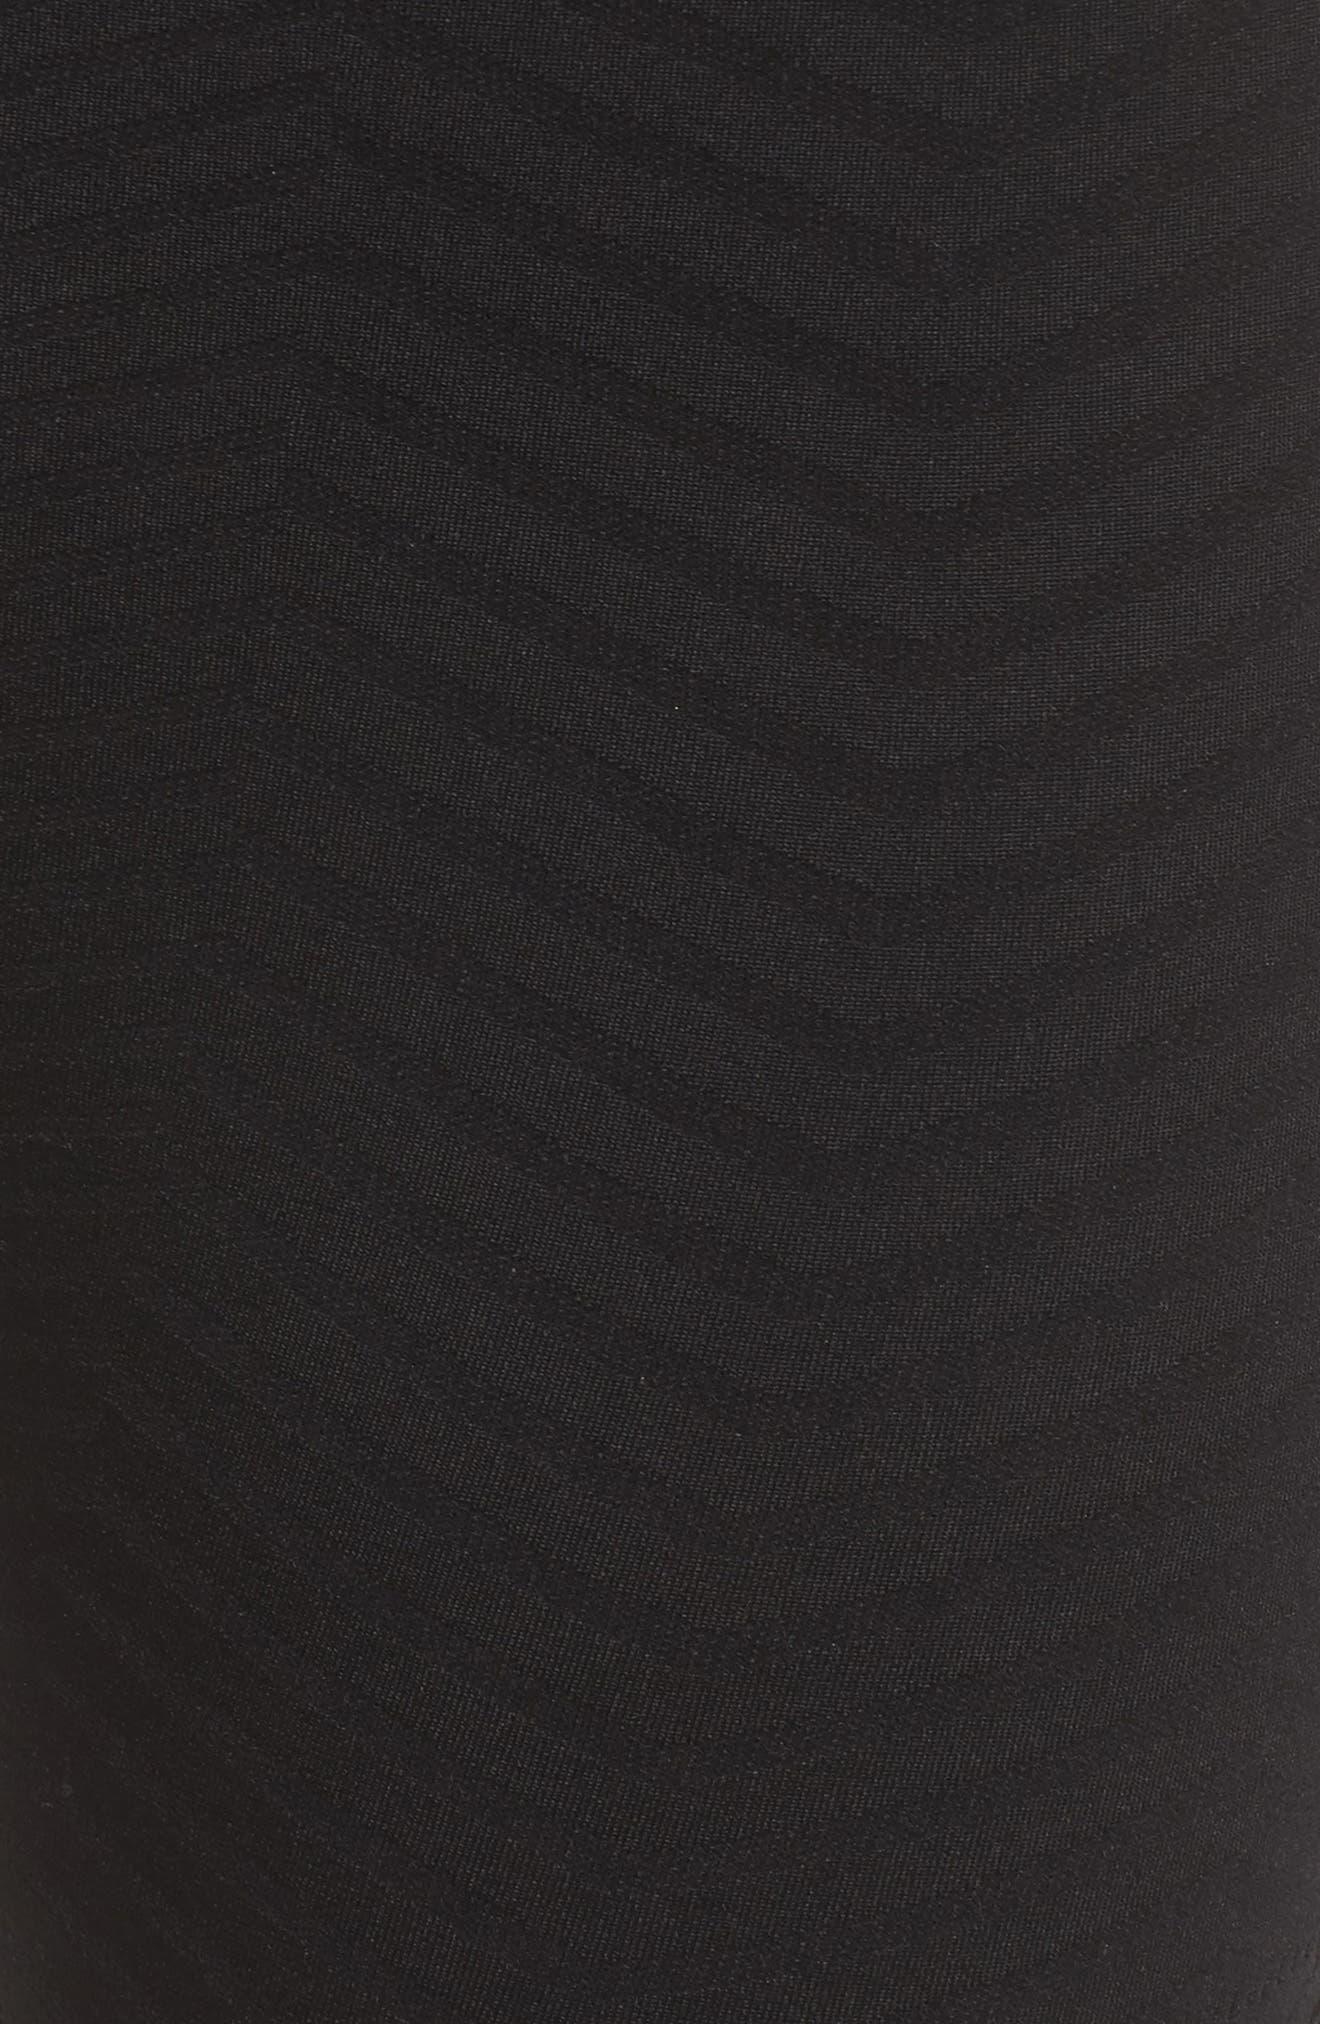 Cadence High Waist Leggings,                             Alternate thumbnail 6, color,                             Black